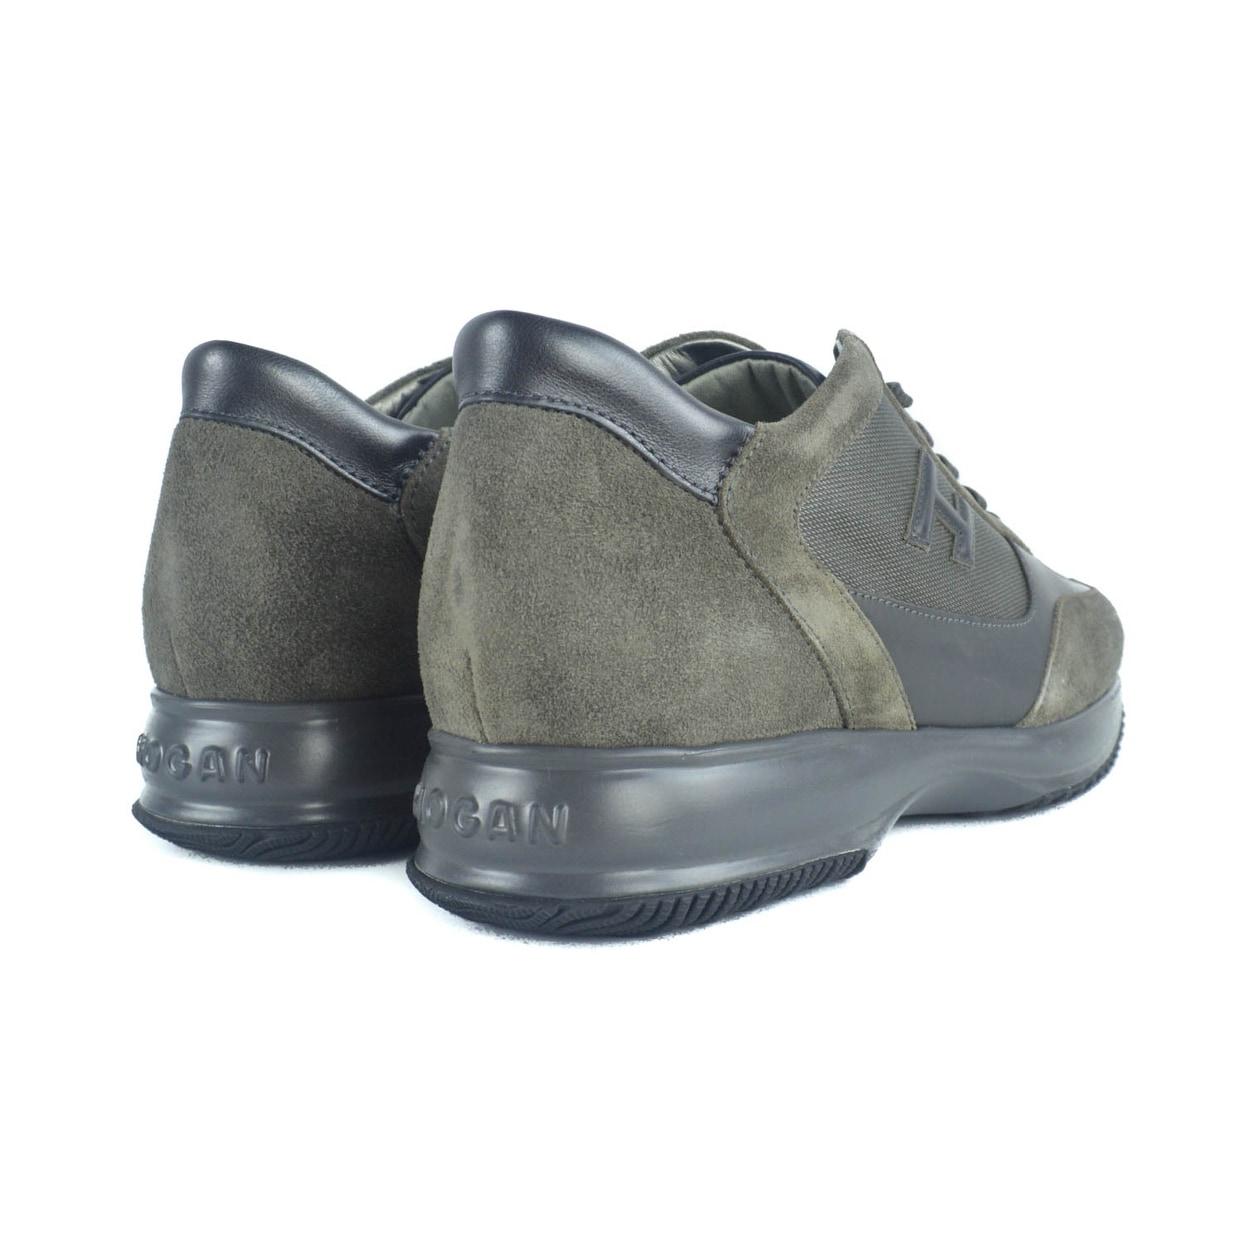 a88f7c144cc Shop Hogan Mens Brown Suede Mesh Interactive Mod H 3D Sneakers ...